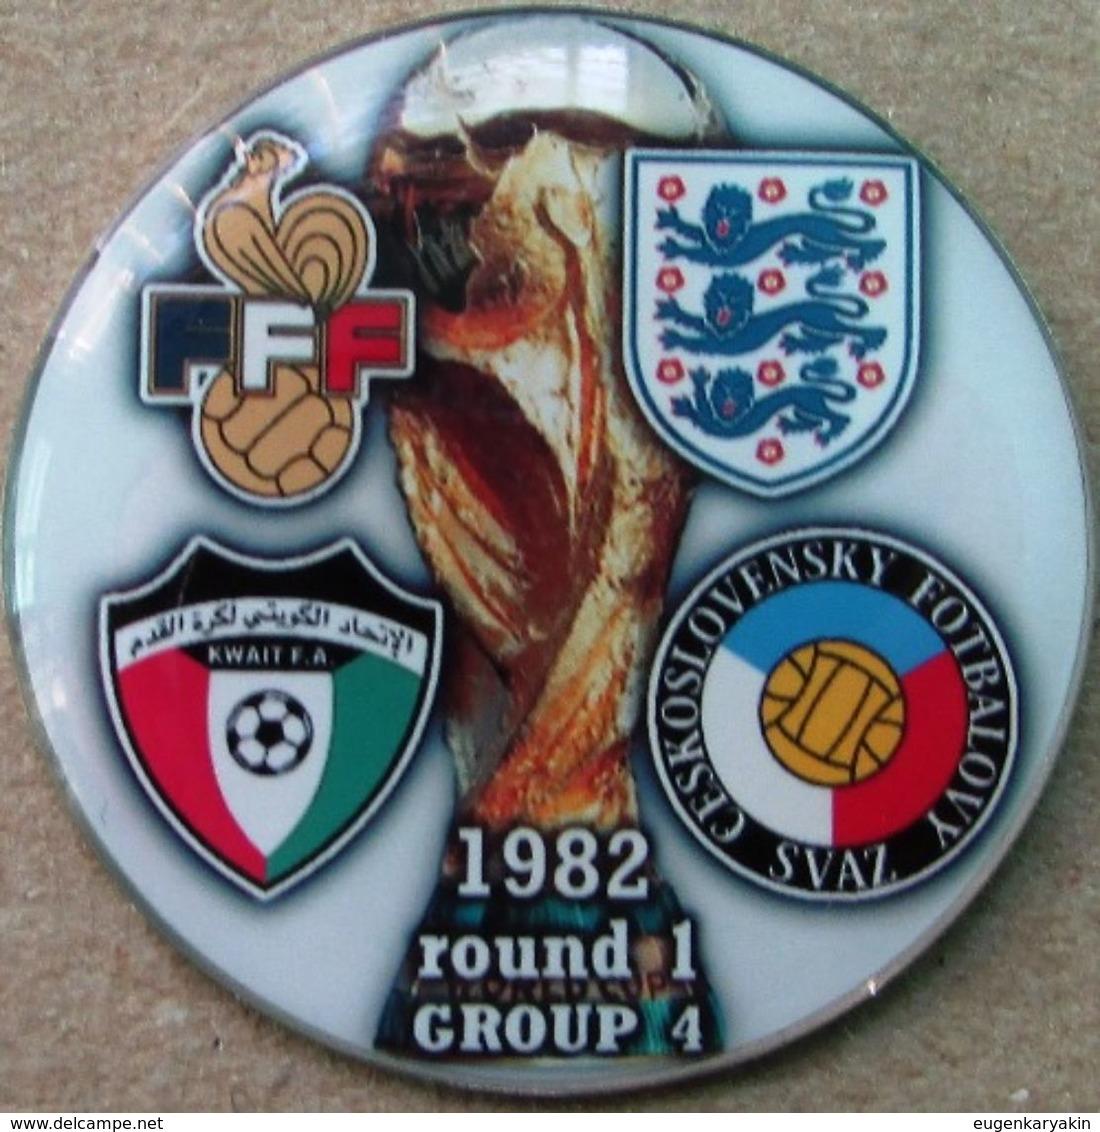 Pin FIFA World Cup 1982 Group 4 Round 1 England France Kuwait Czechoslovakia - Fussball